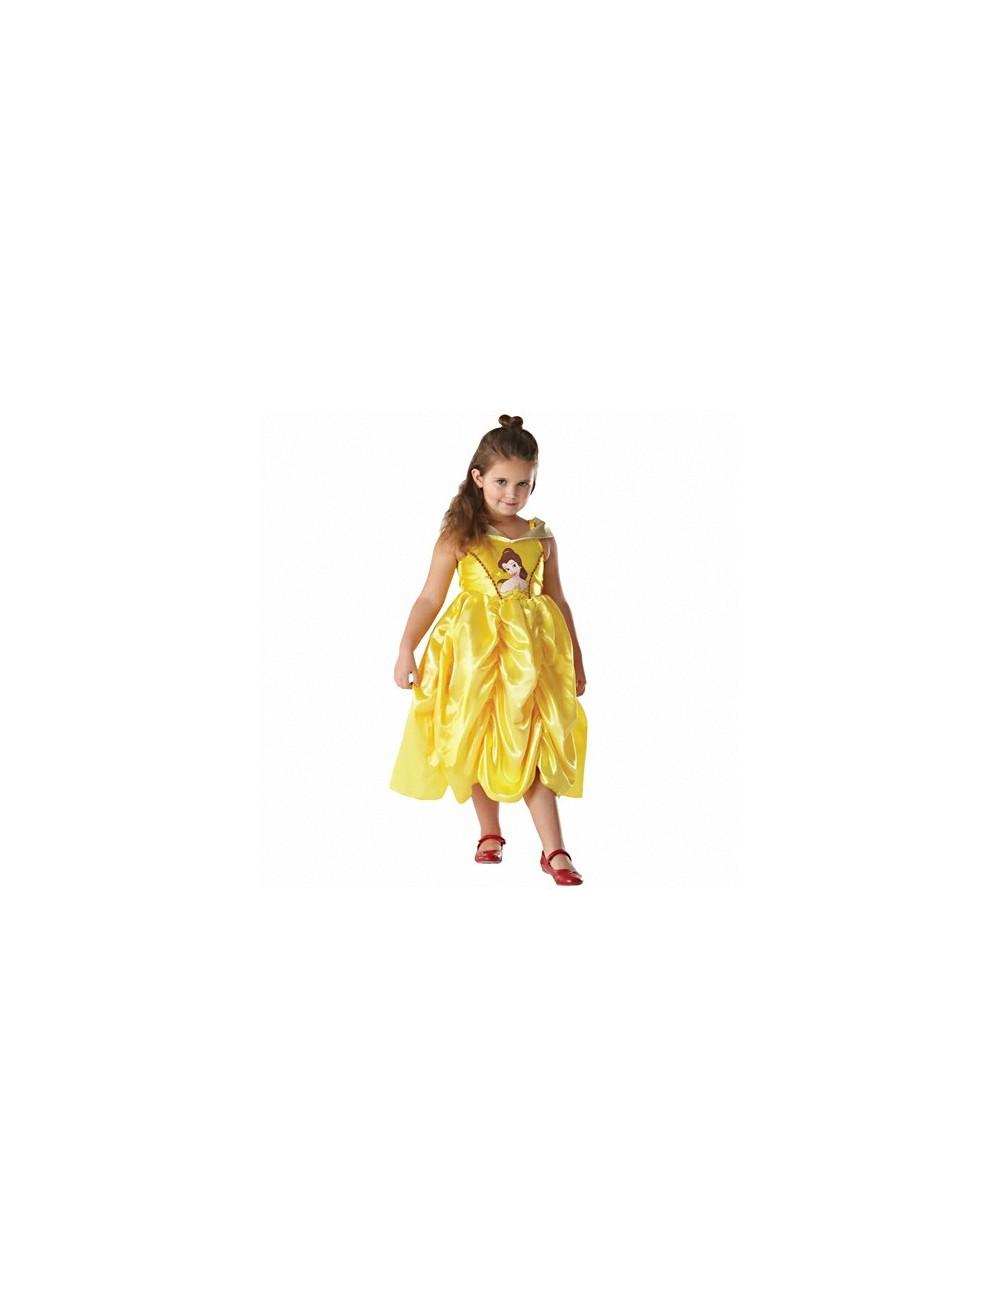 Costum Printesa Belle Clasic Rubie's